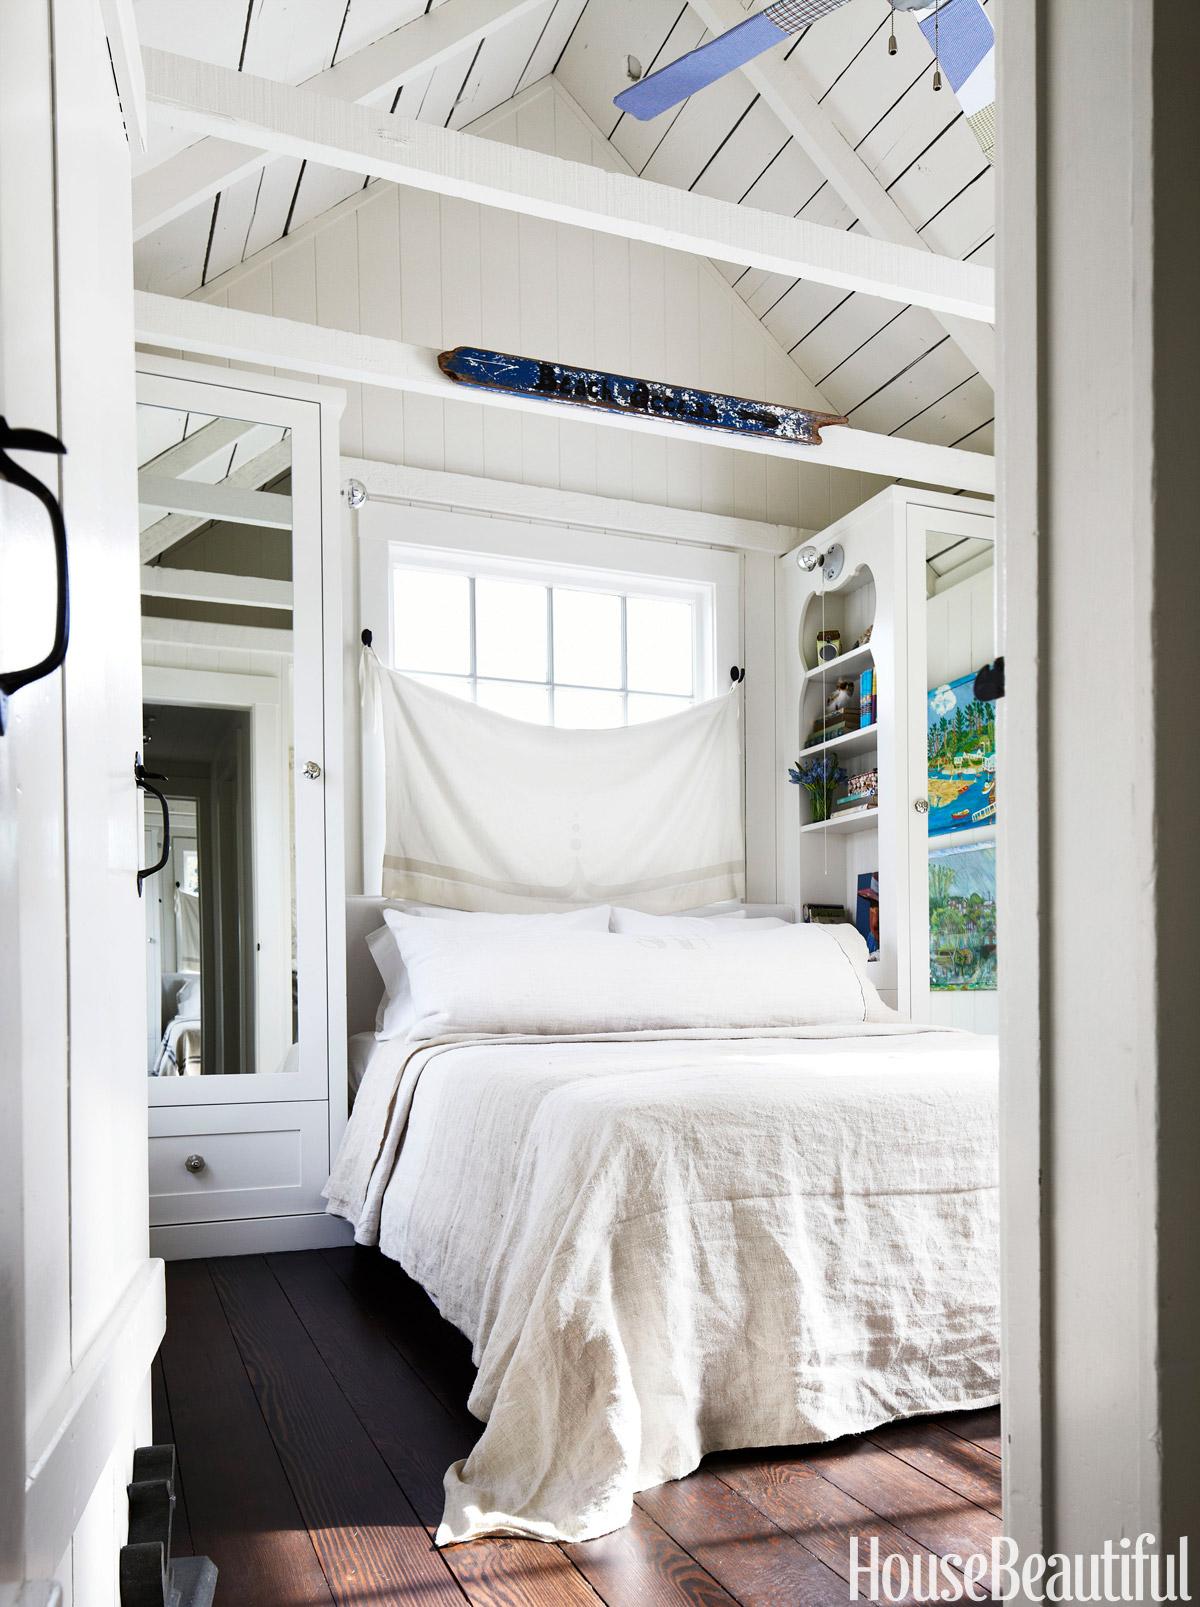 10 Small Bedroom Decorating Ideas